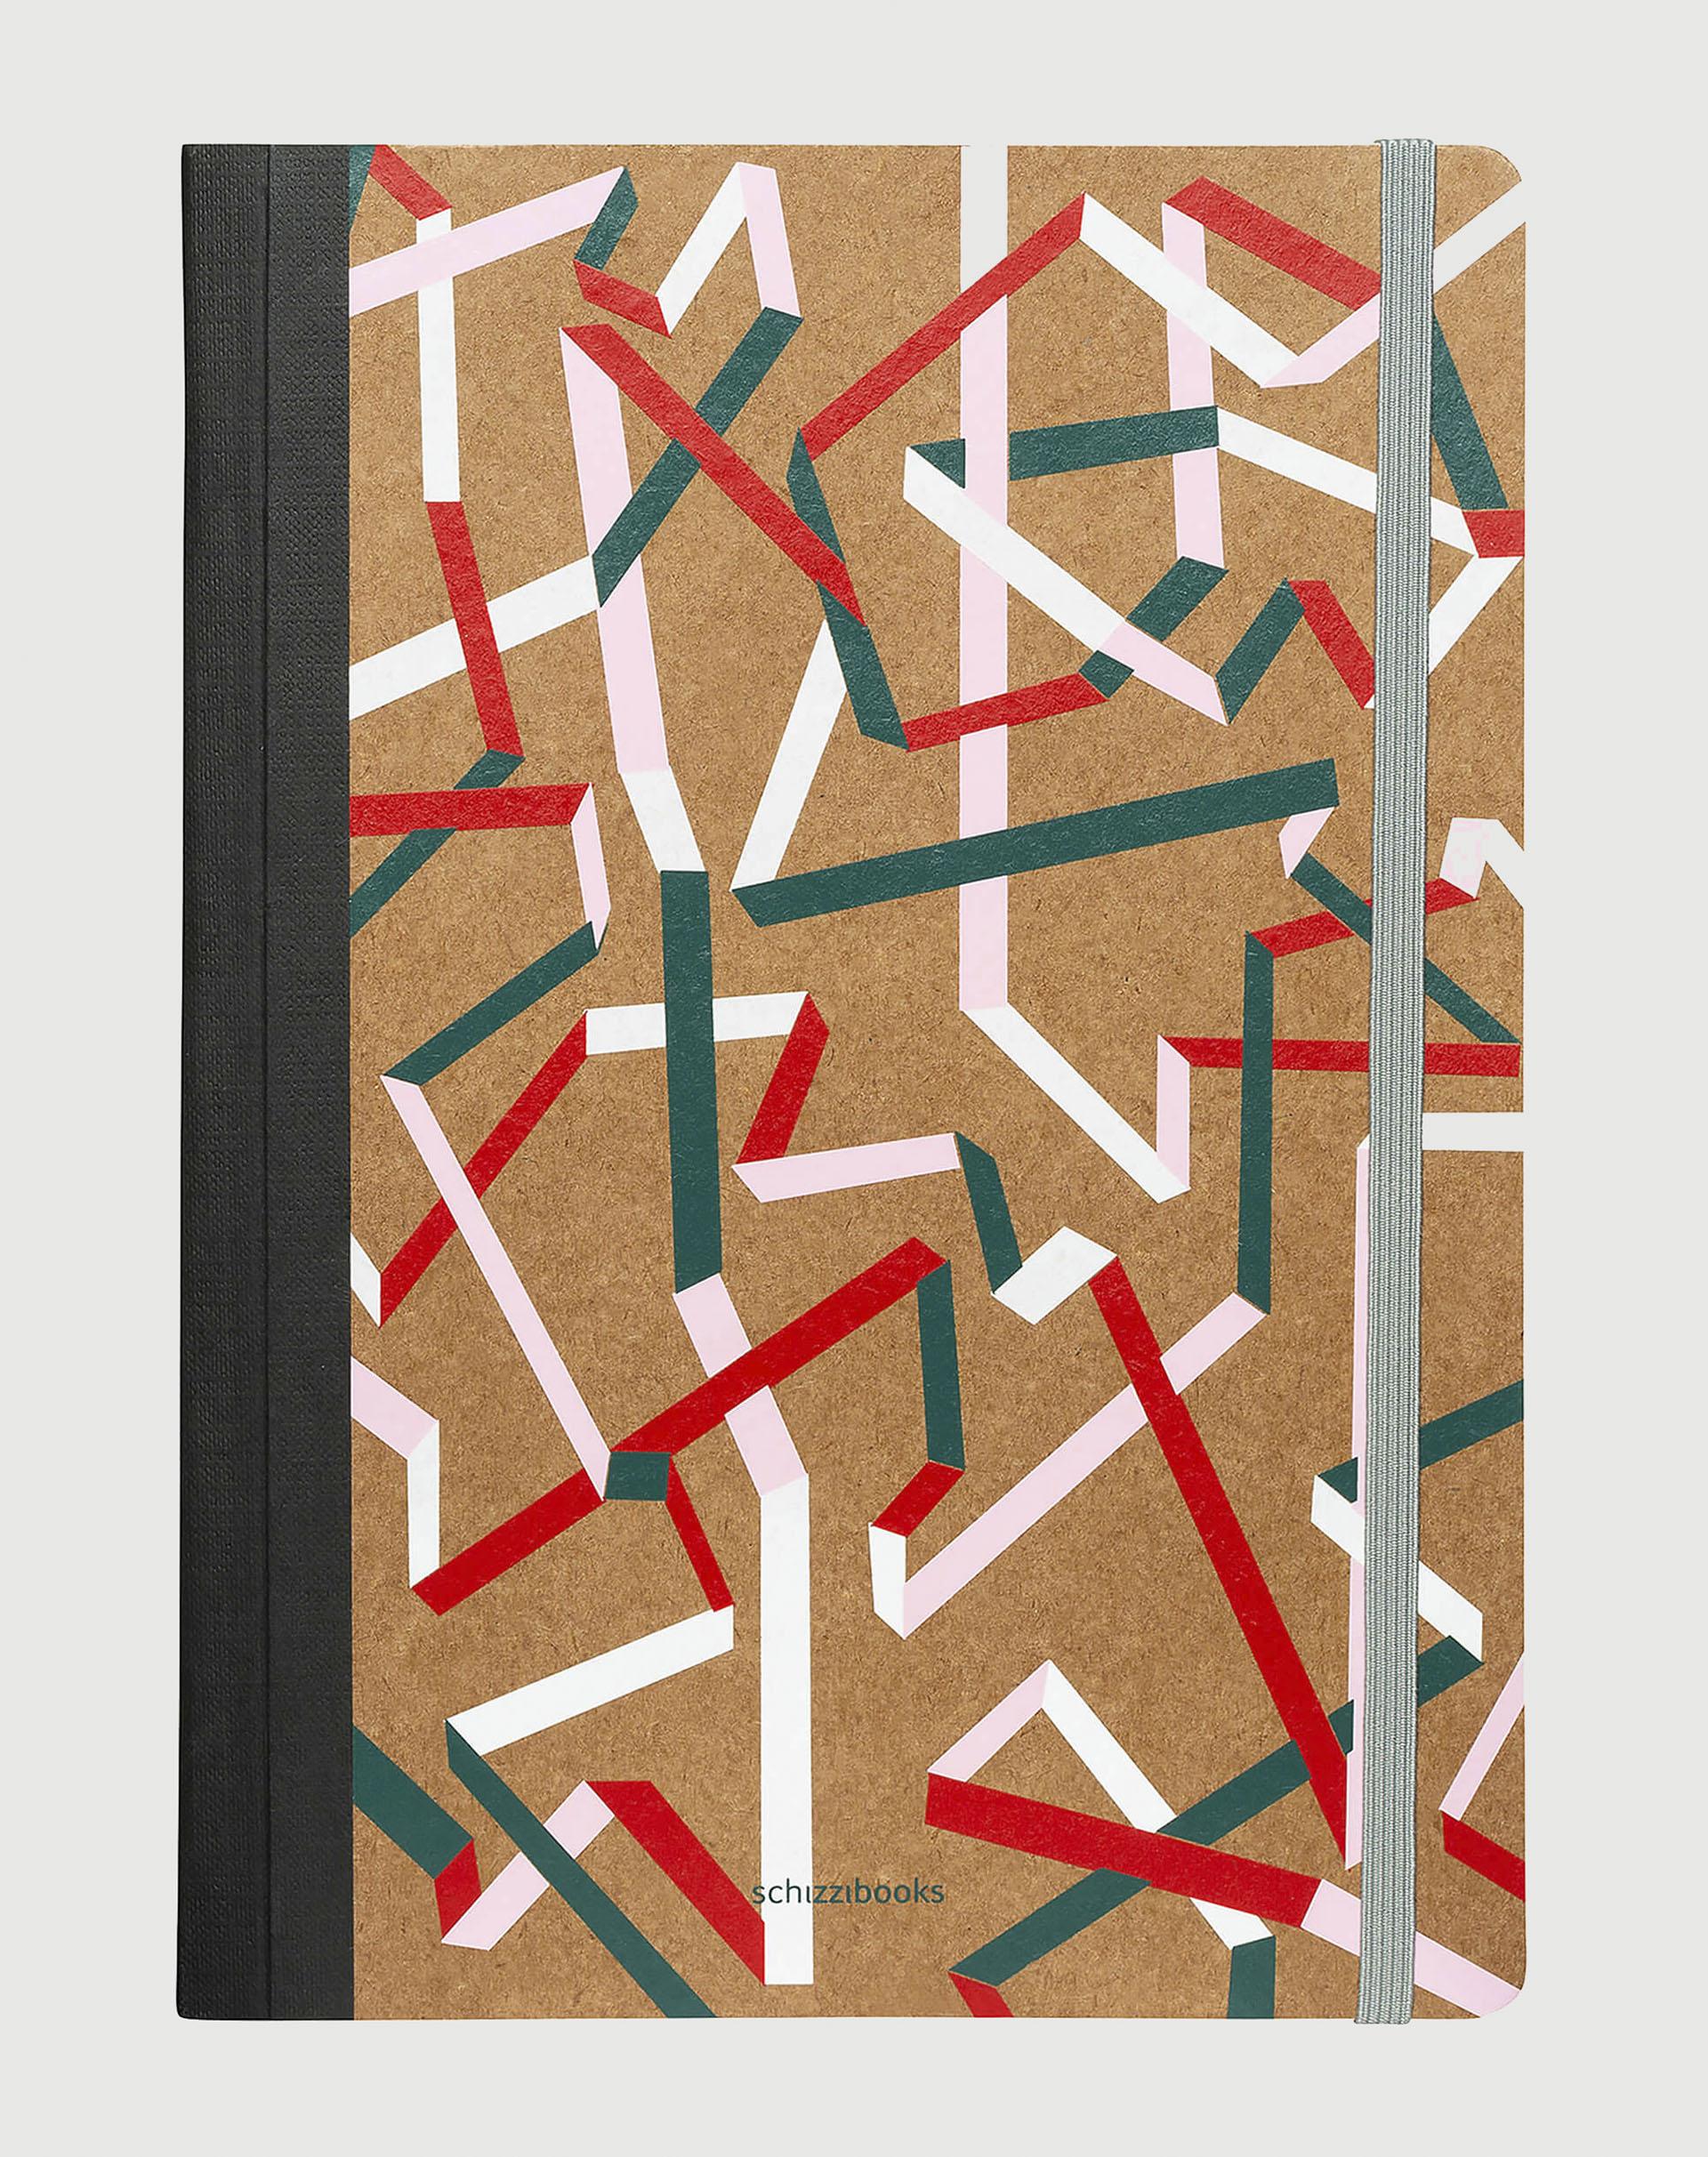 AMARO Feminino SCHIZZIBOOKS CADERNO XLARGE, RAINBOW